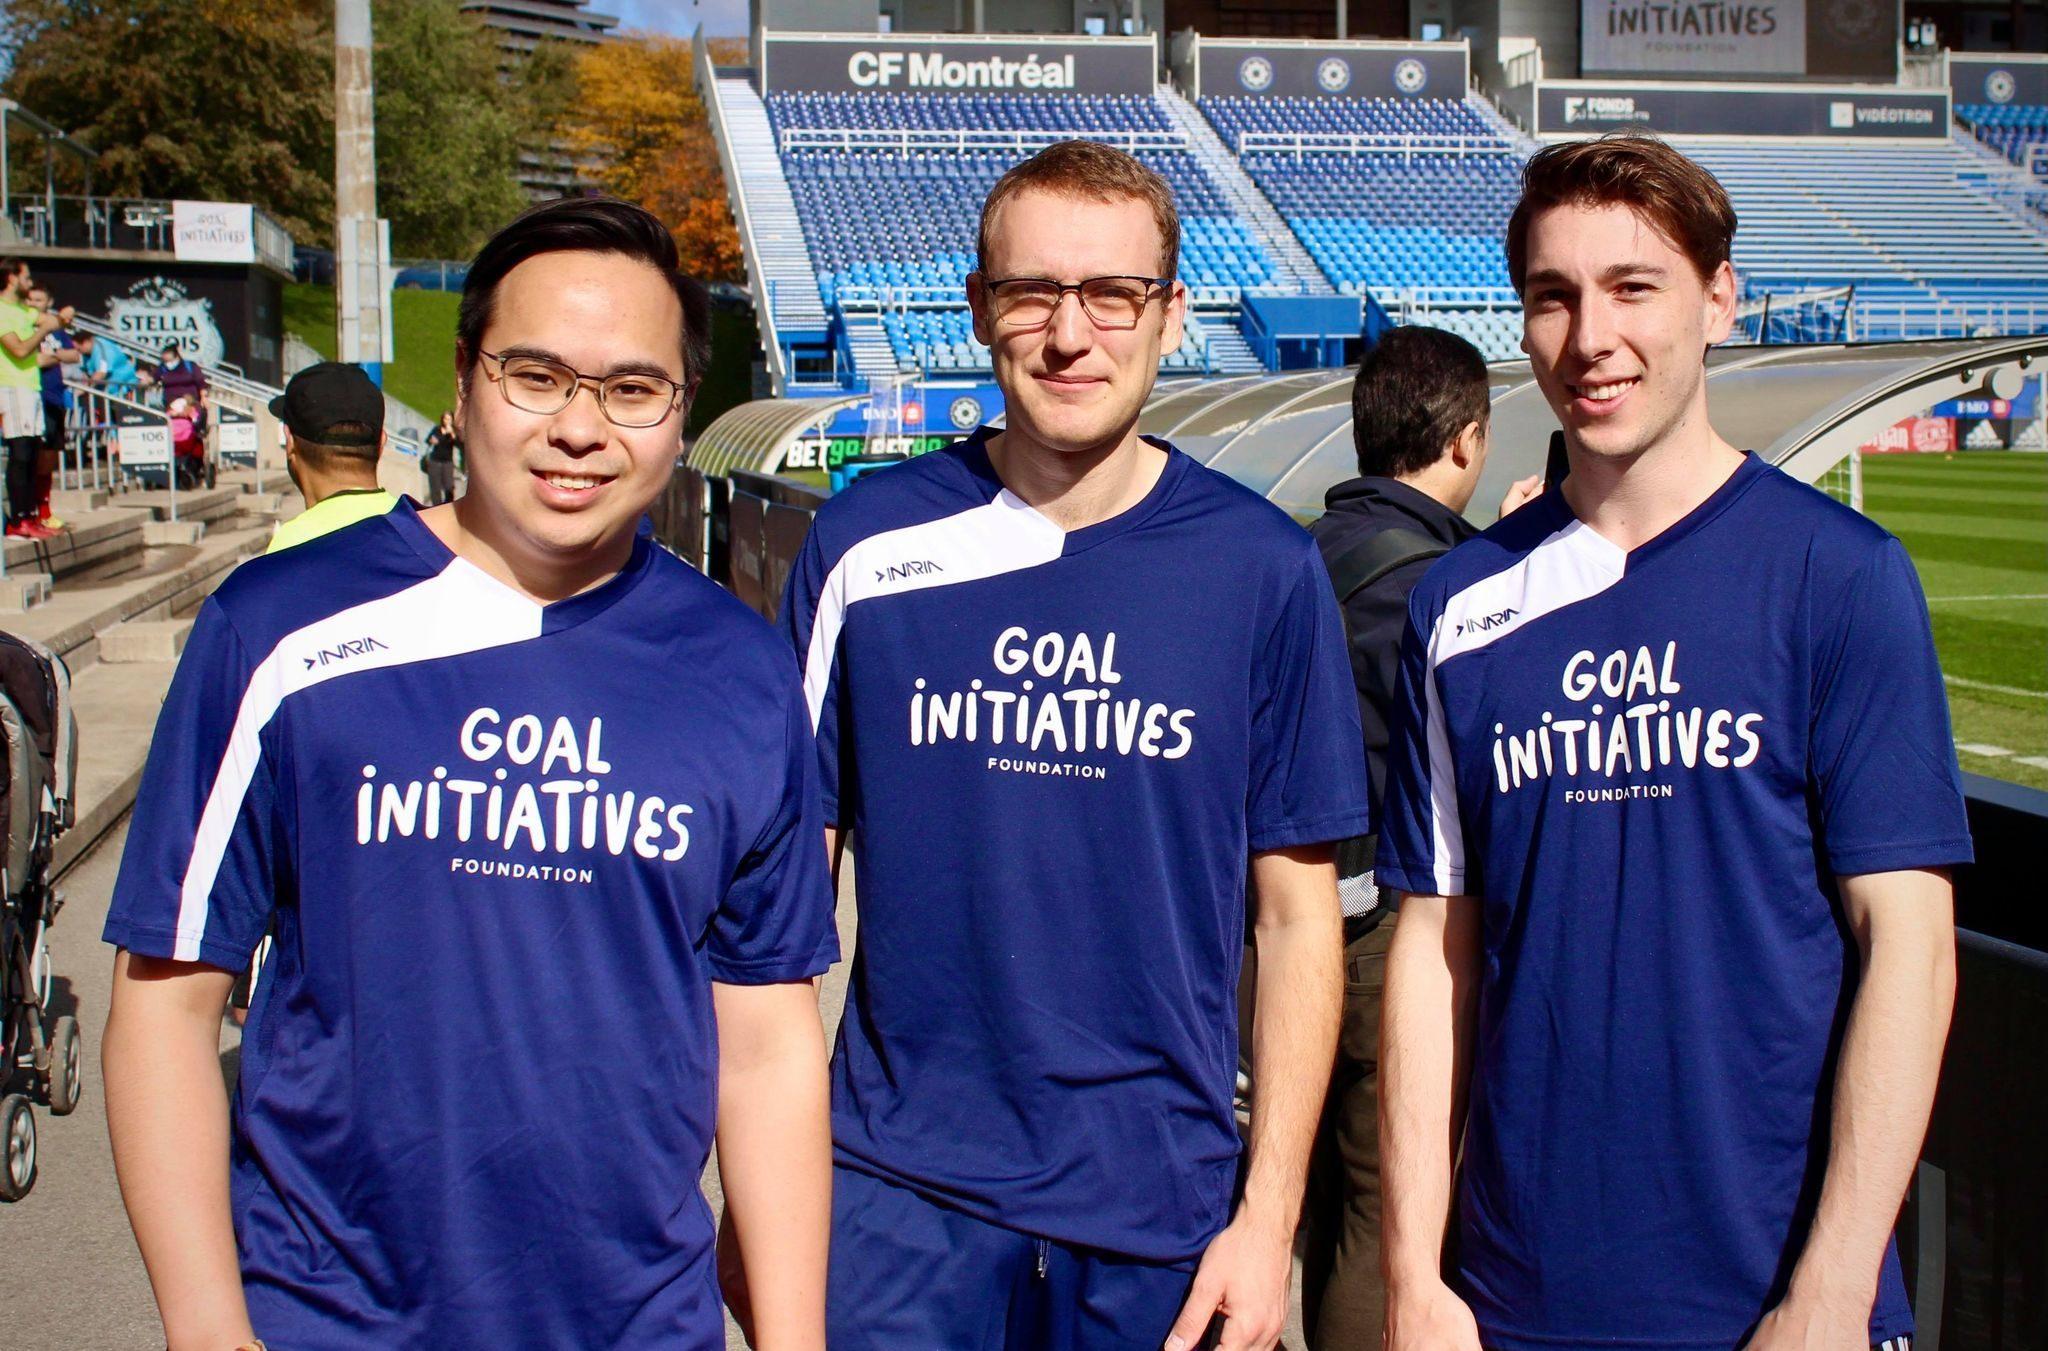 PHOTOS: GOAL MTL scores big with a successful 2021 tournament